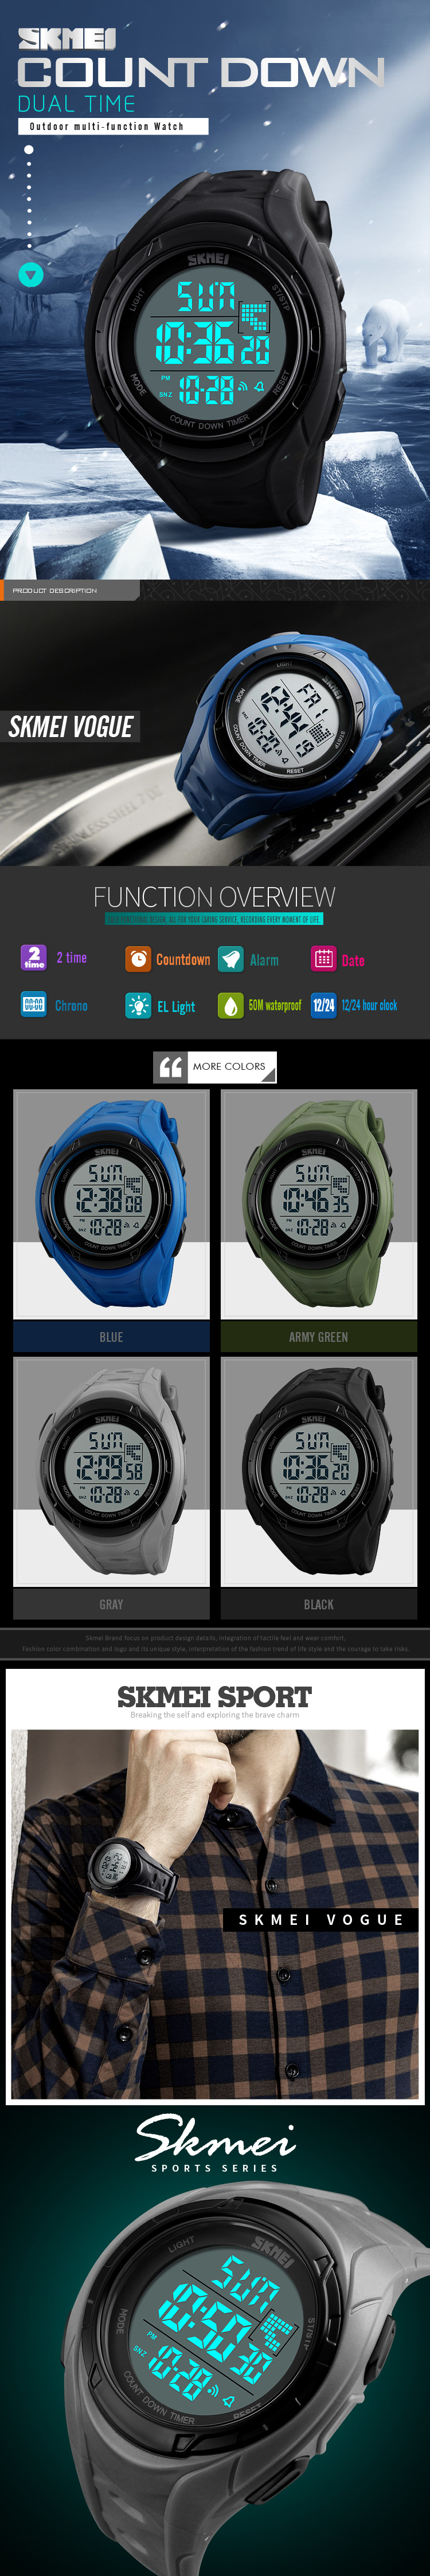 masculino esportes relógios digital led militar relógio